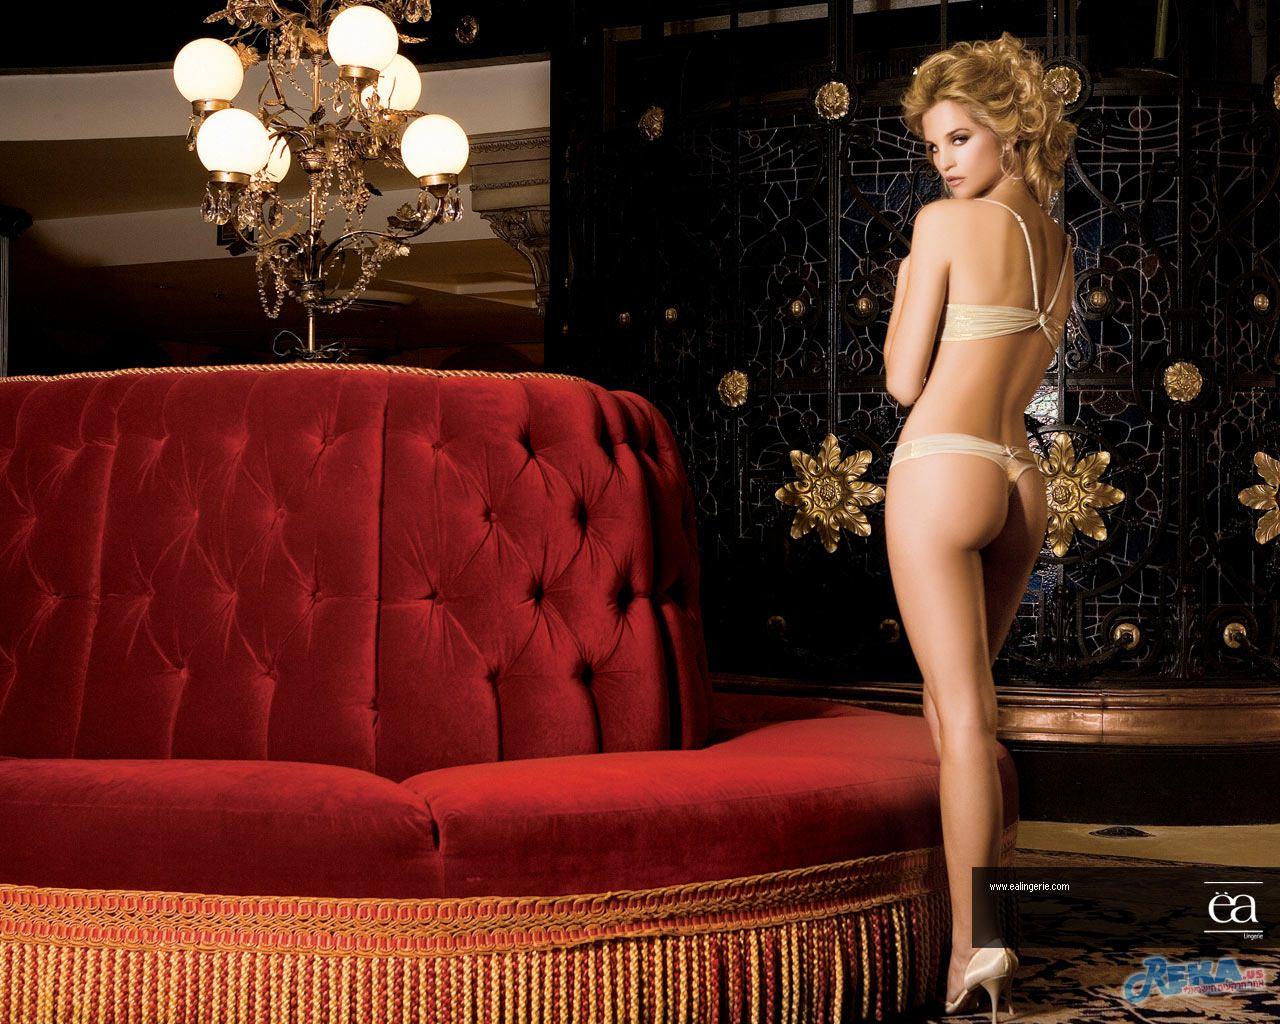 Liz_Solari_-_EA_Lingerie_-_Queens_Glam_2007_-_Wall_B_-_1280x1024.jpg